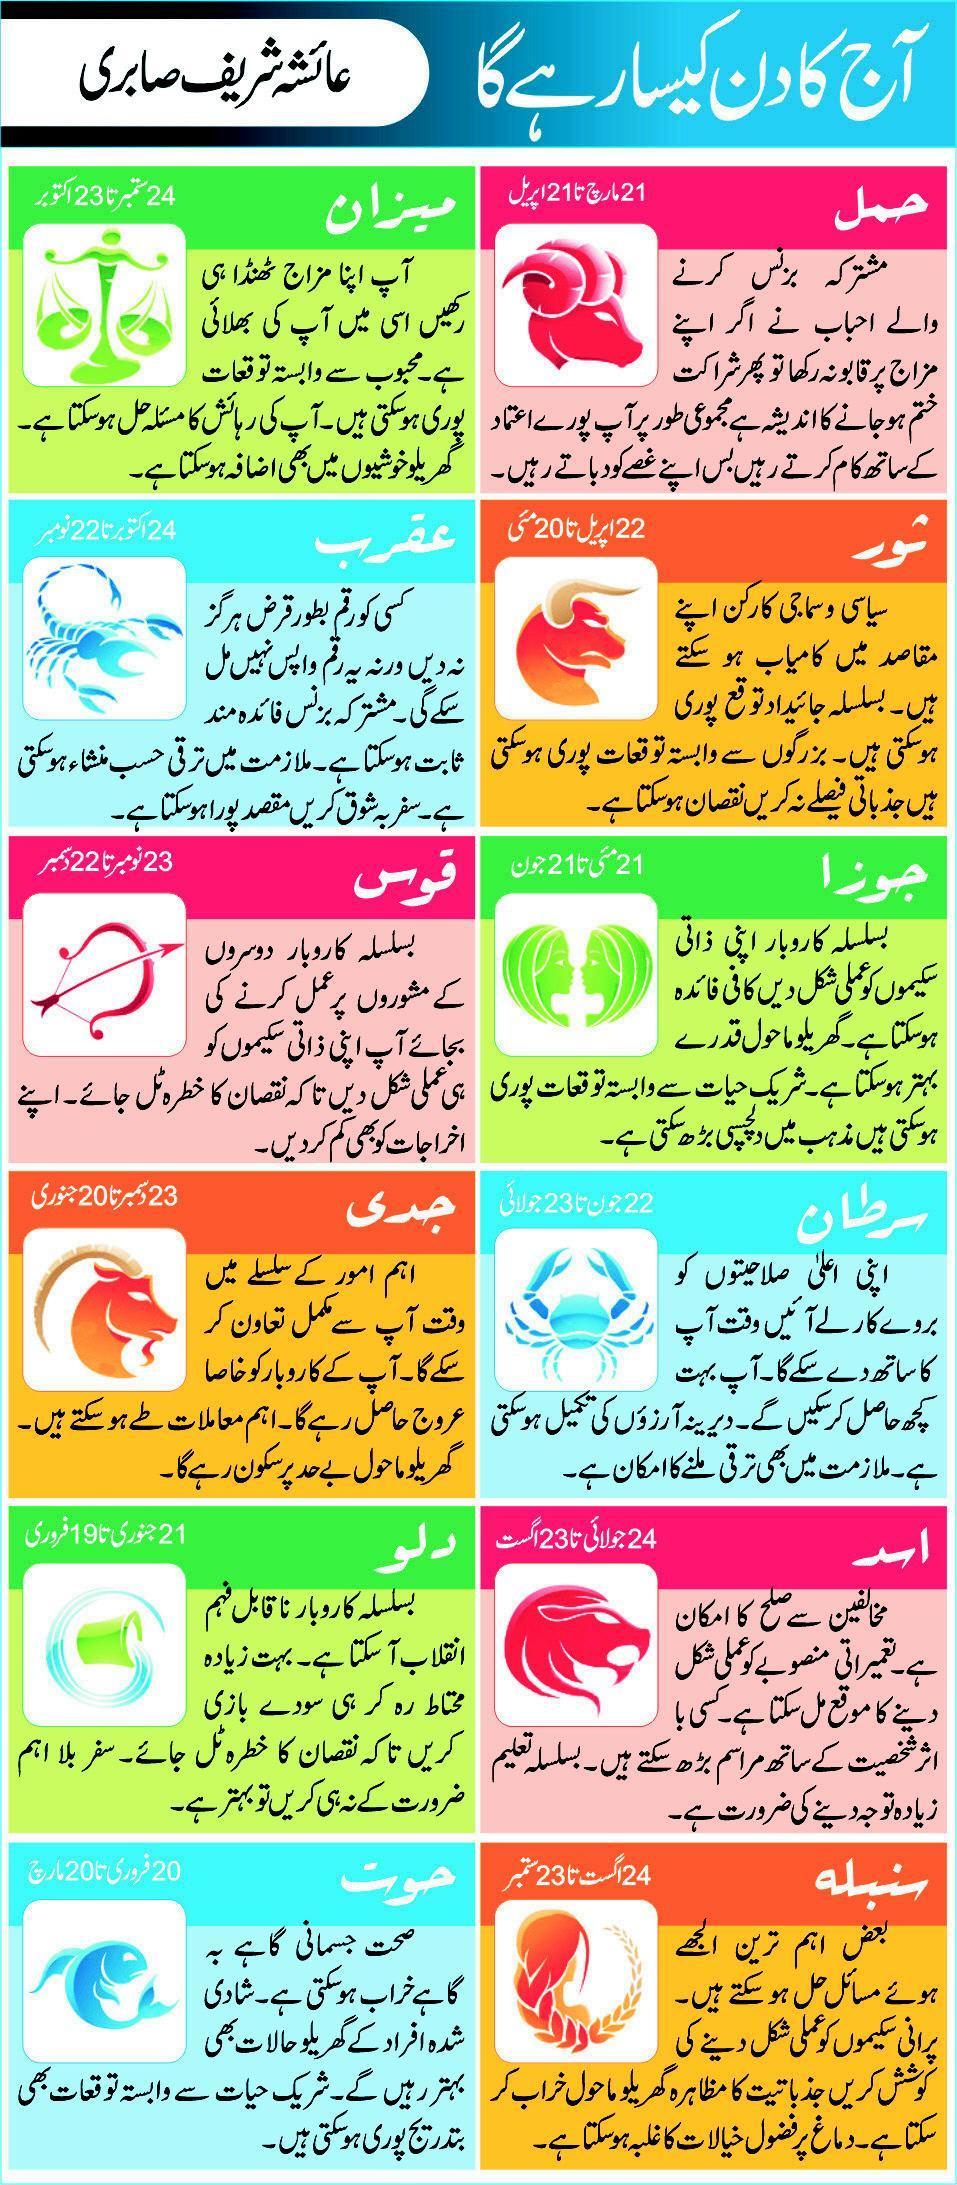 Daily Horoscope in Urdu 24 November 2015 Read Online